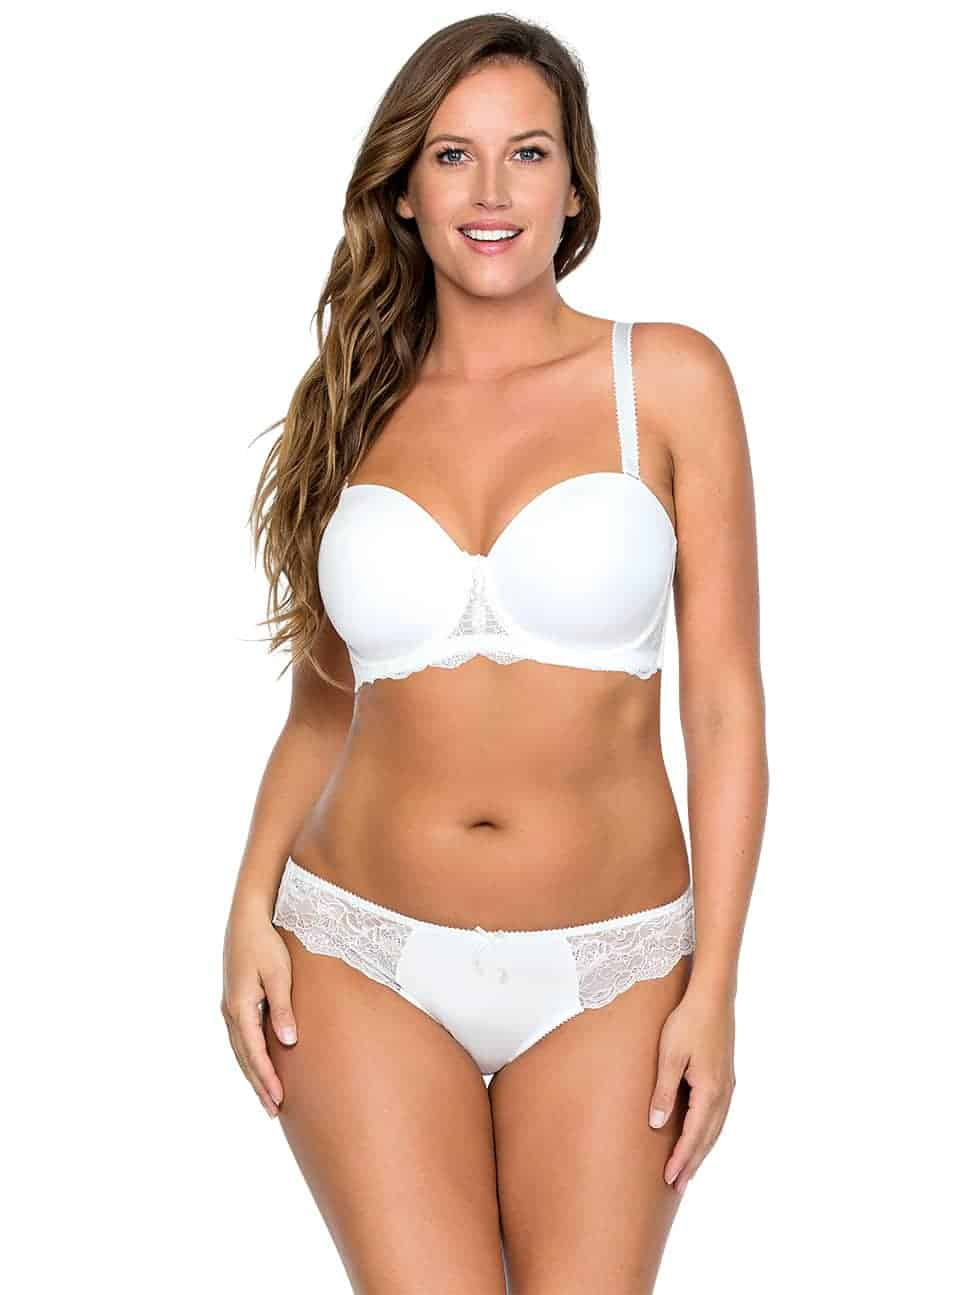 Elissa StraplessBraP5011 BrazilianThongP5014 PearlWhite Front copy - Elissa Strapless Bra - Pearl White - P5011